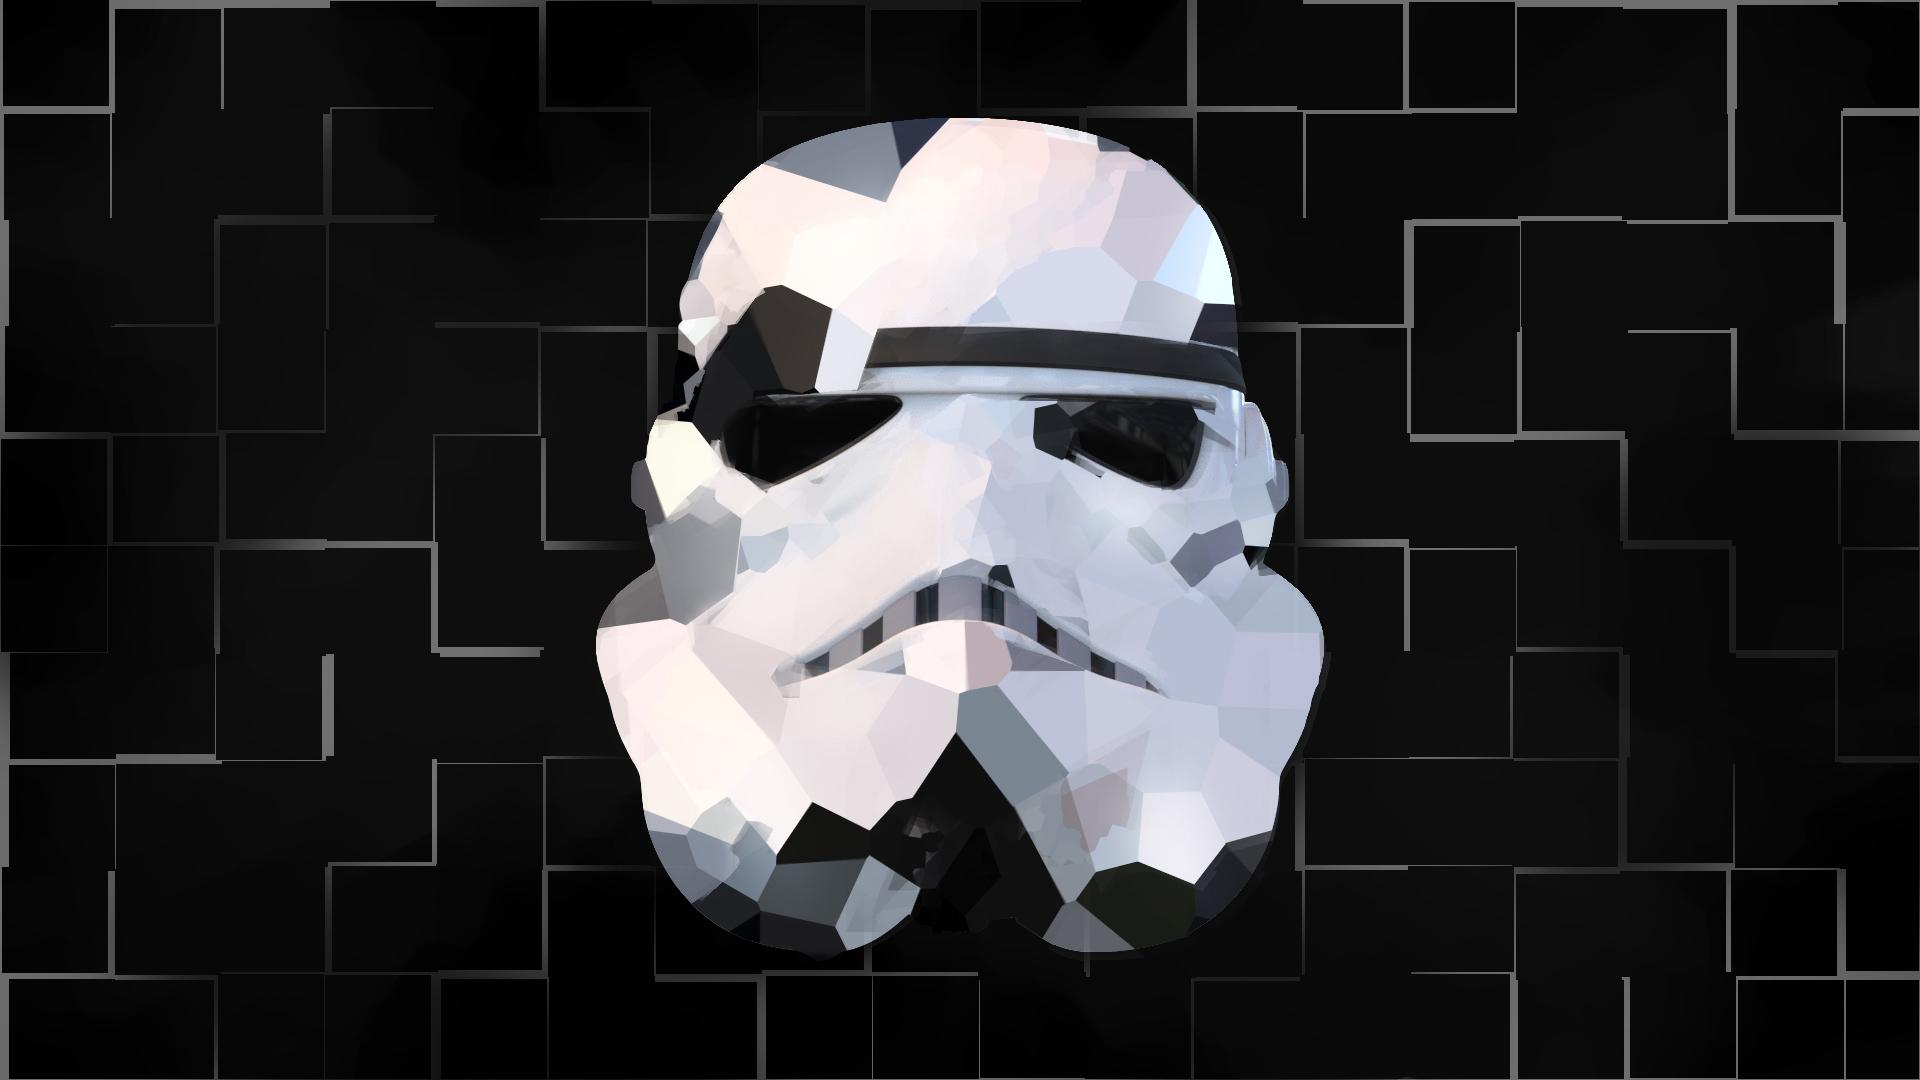 Stormtrooper minimalist by LMcentury21 Stormtrooper minimalist by LMcentury21